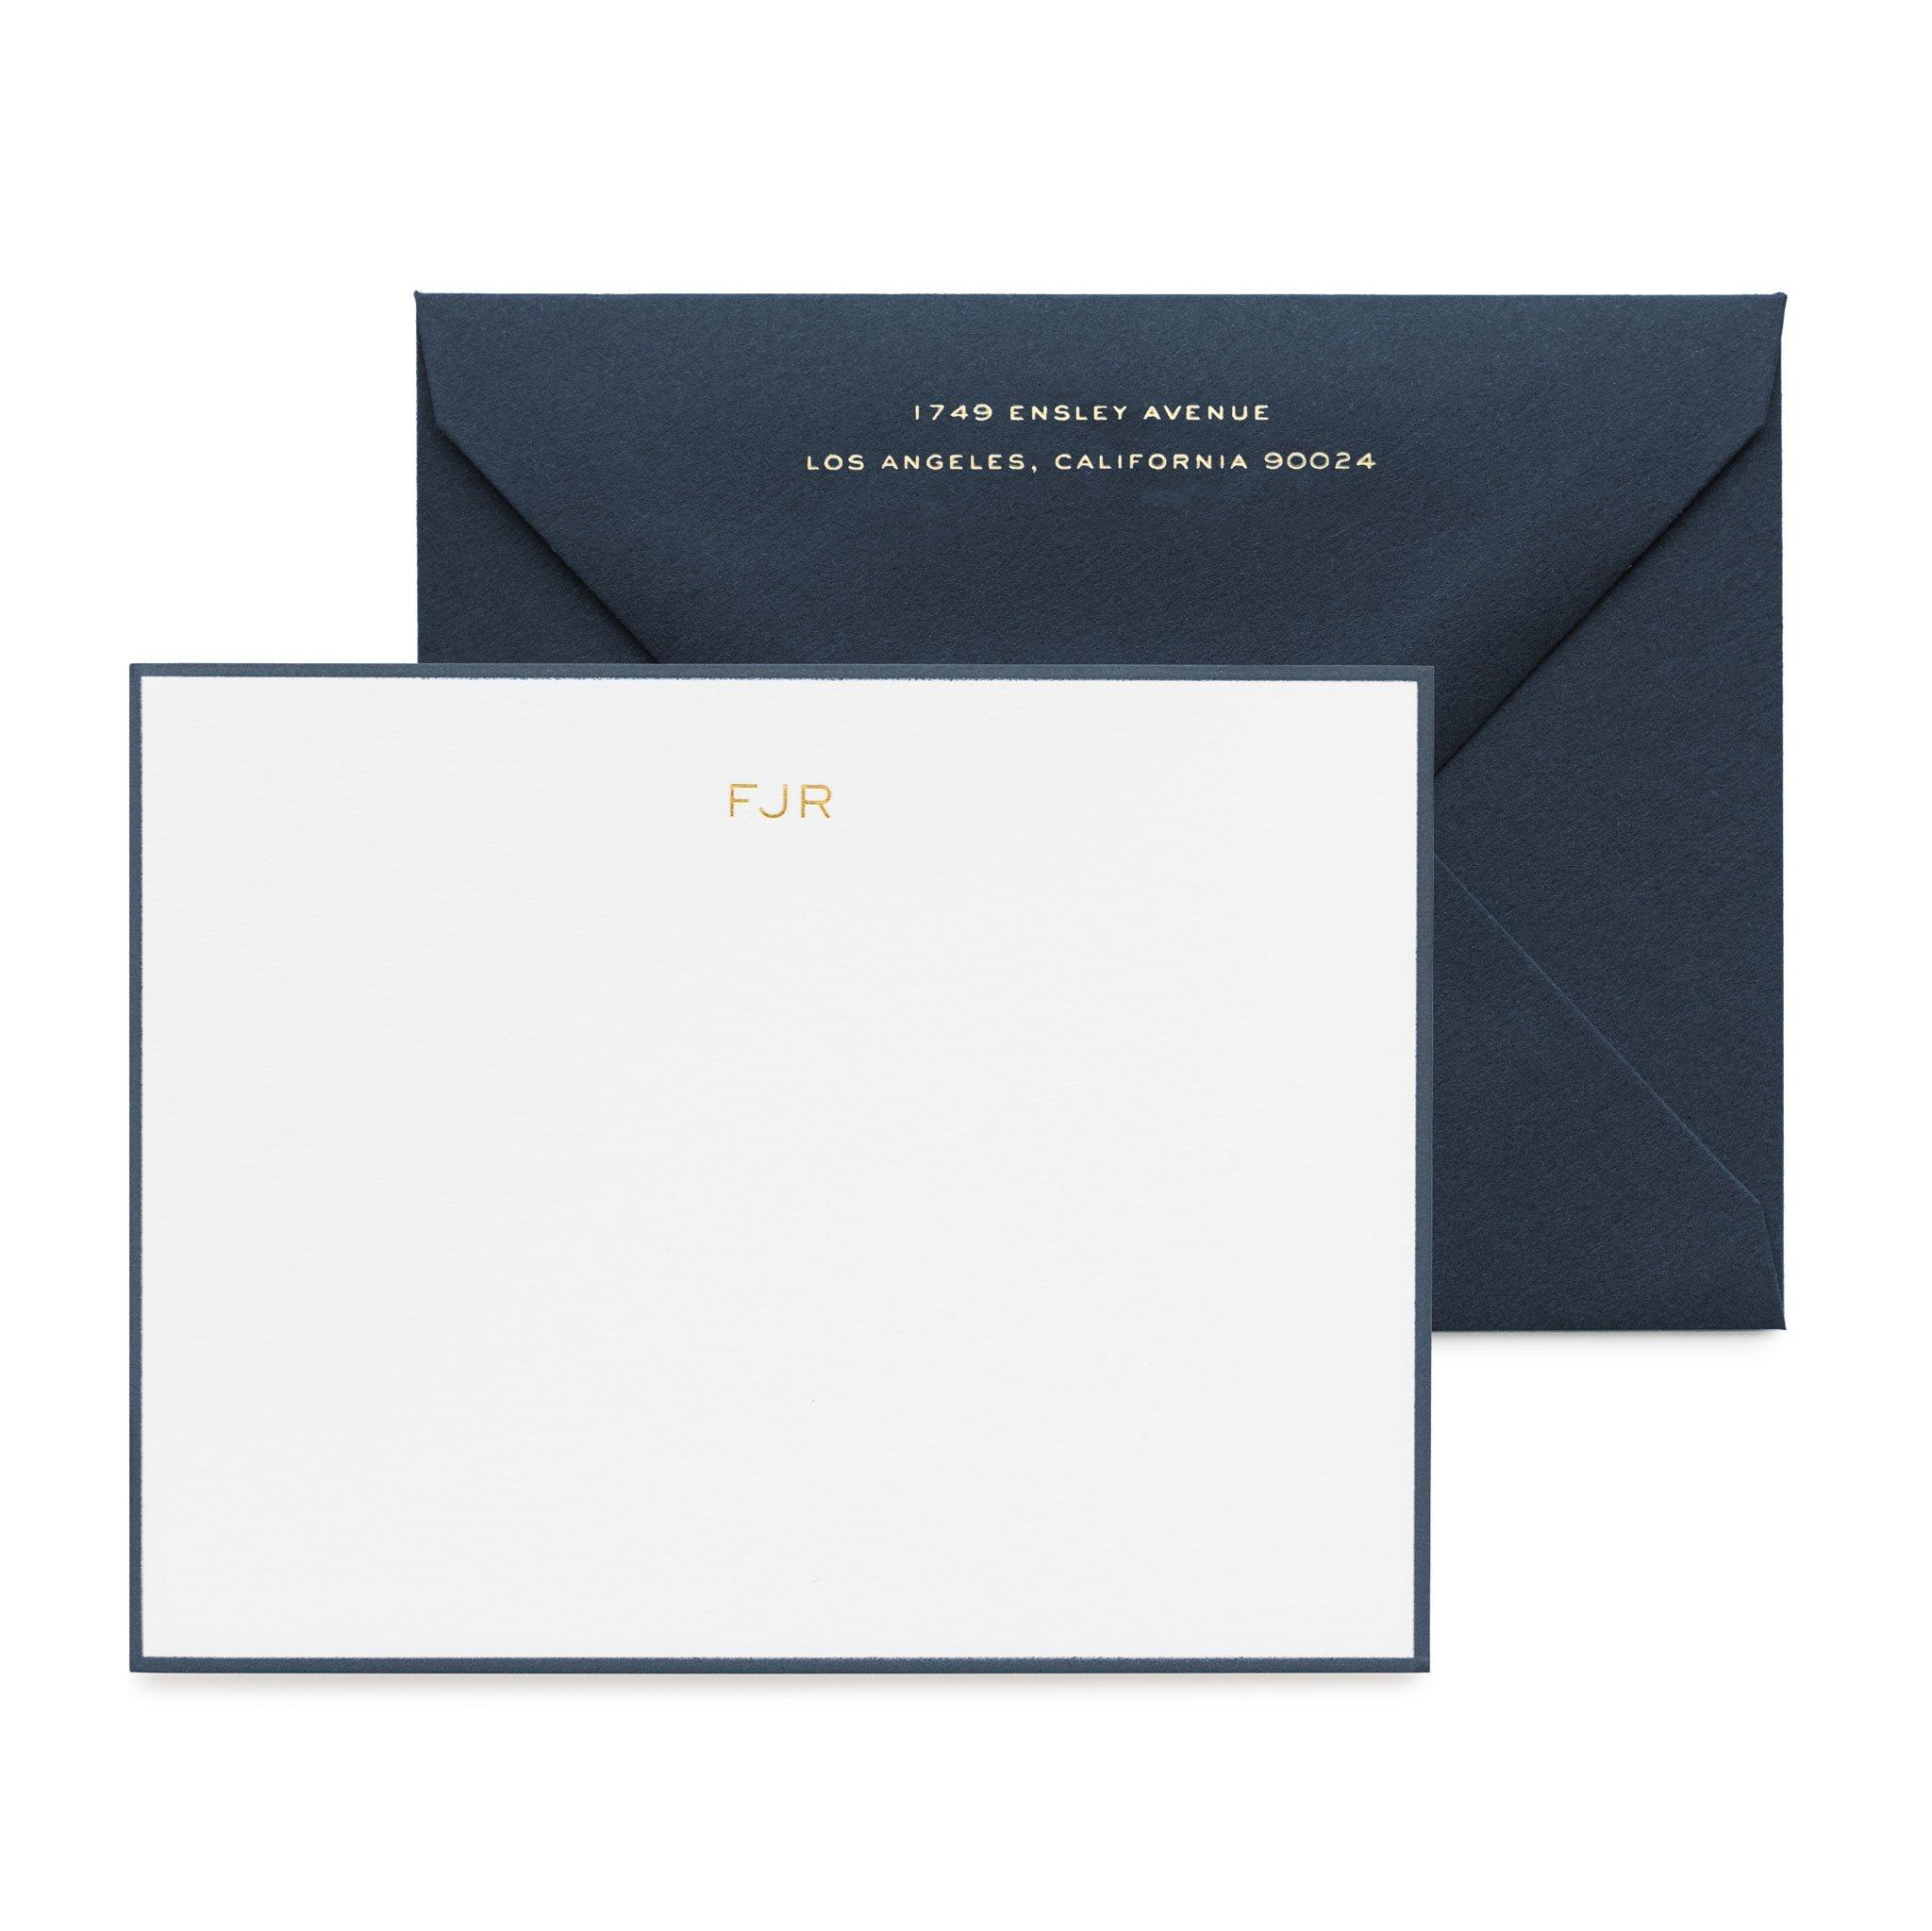 OPS06_FJR_Navy-envelope-web_1200x1200@2x